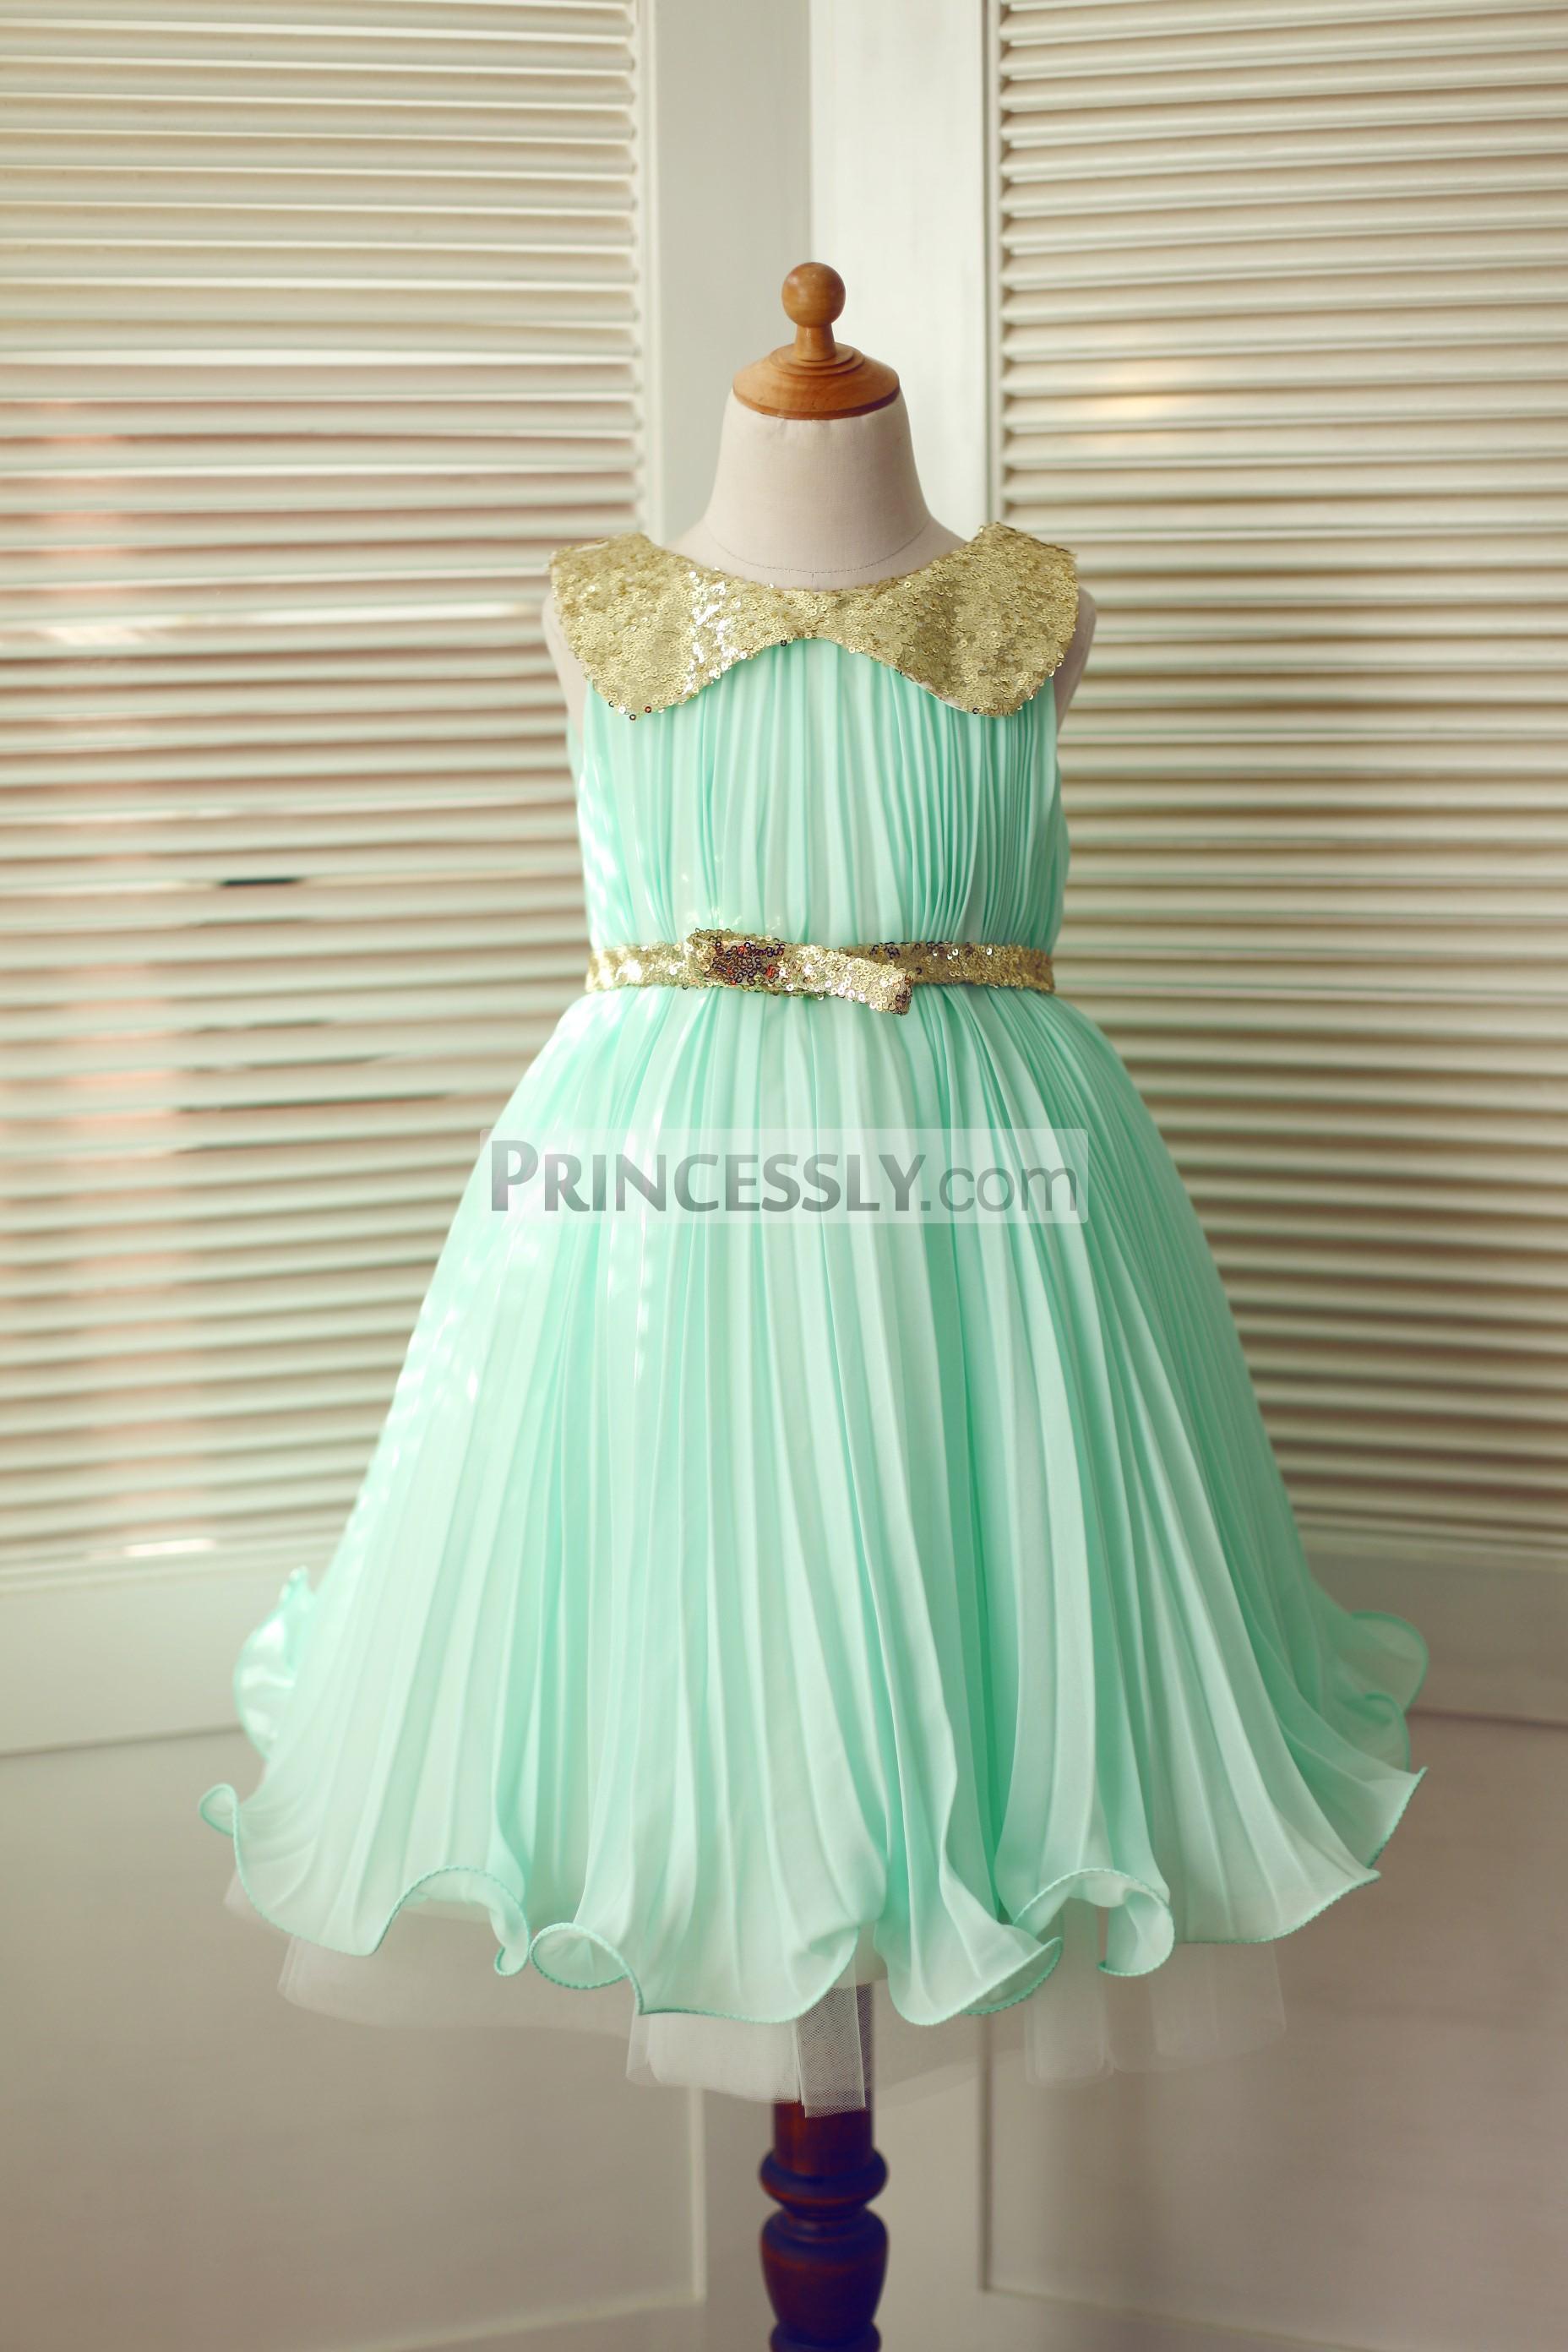 How To Buy A Designer Wedding Dress